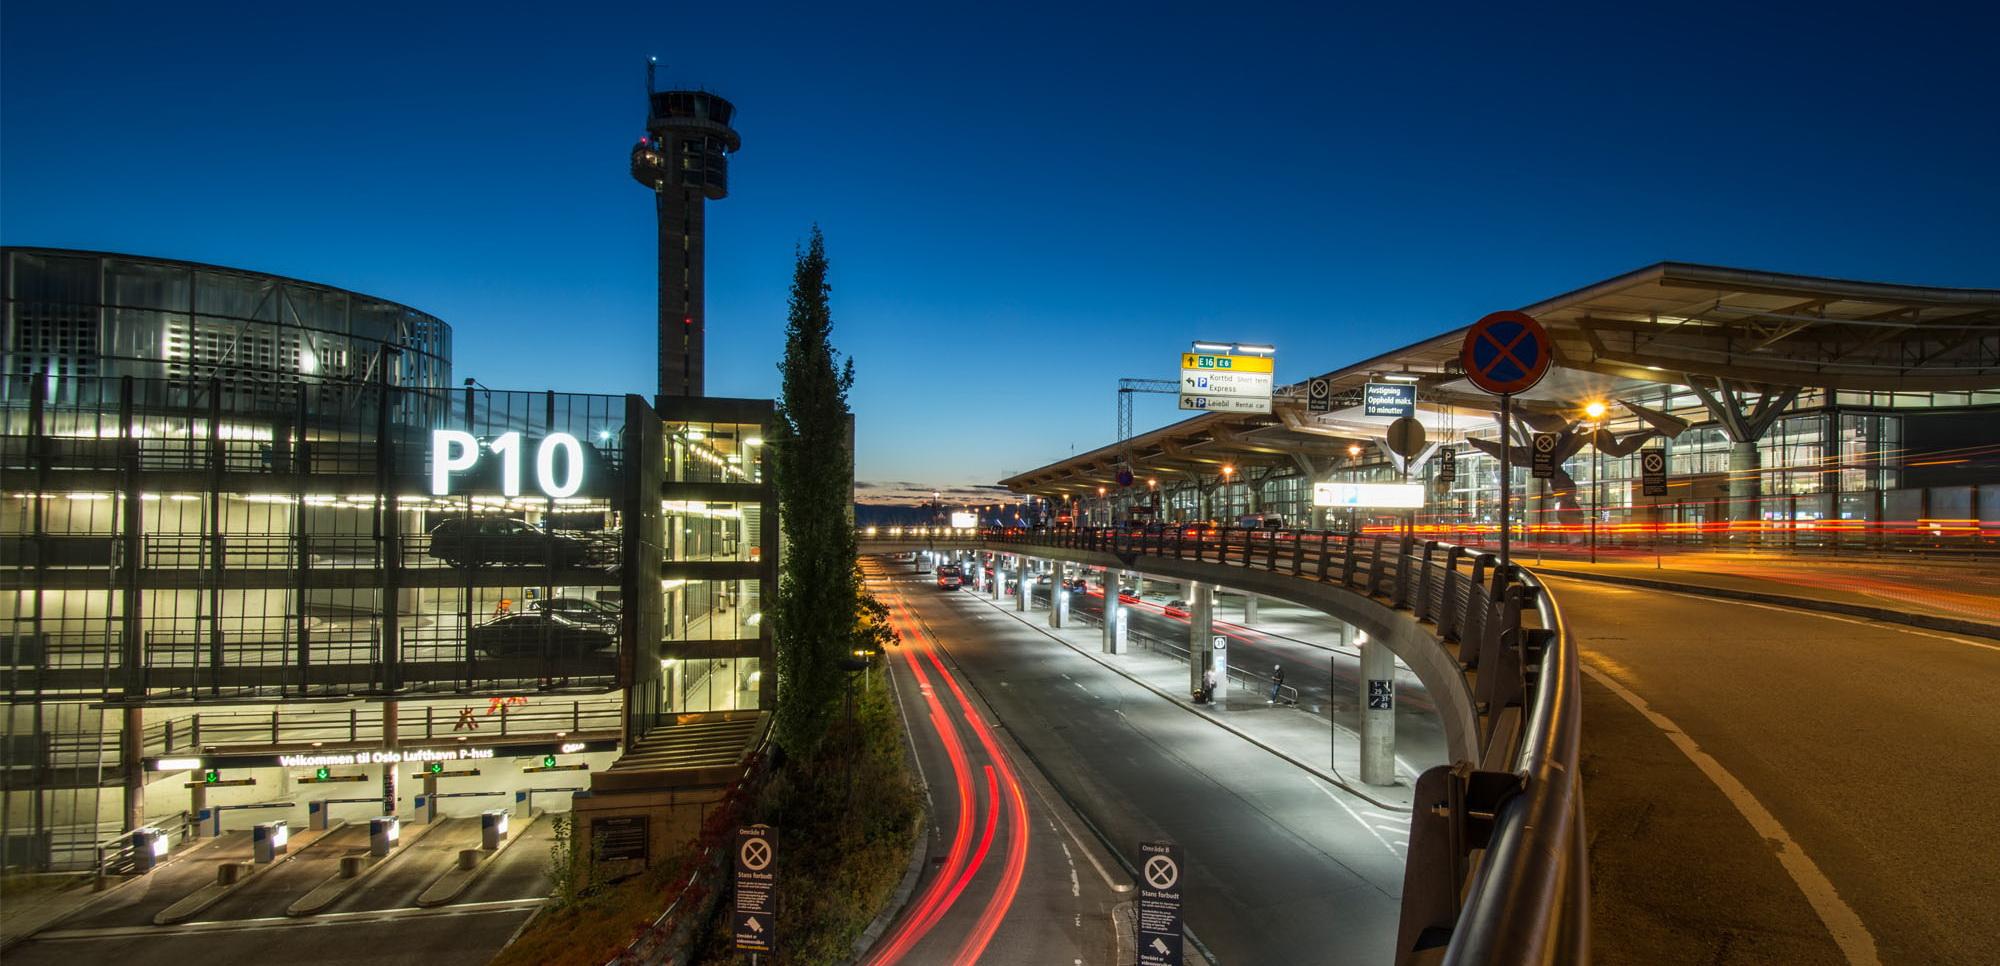 Flyplassparkering på Oslo lufthavn Gardermoen